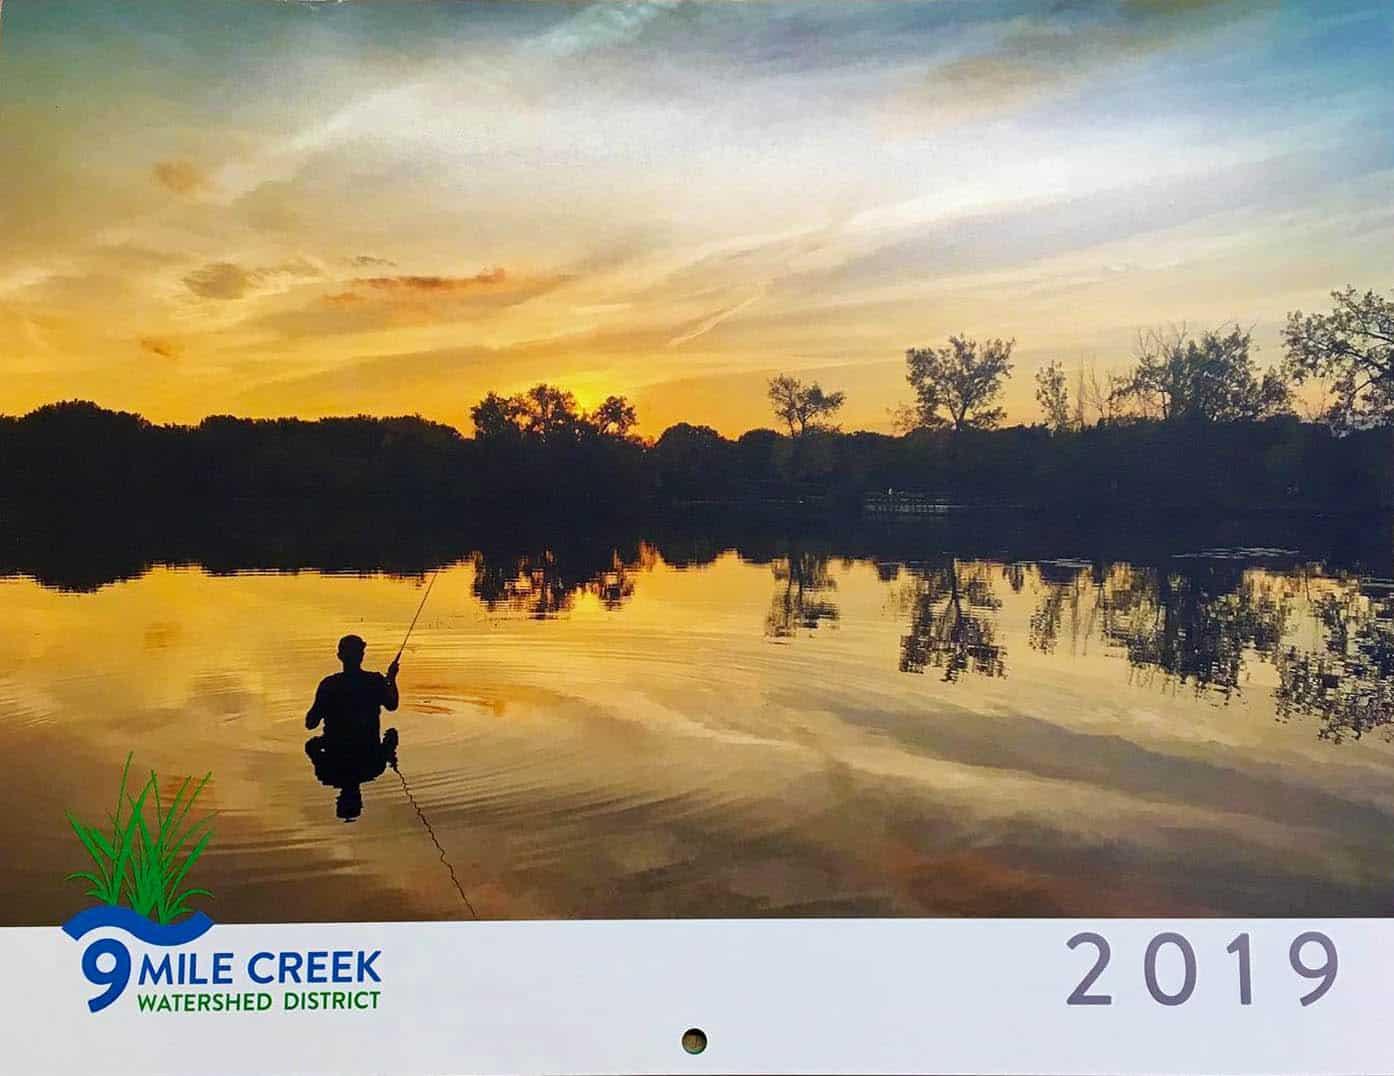 2019 Nine Mile Creek Cover Calendar Winner!